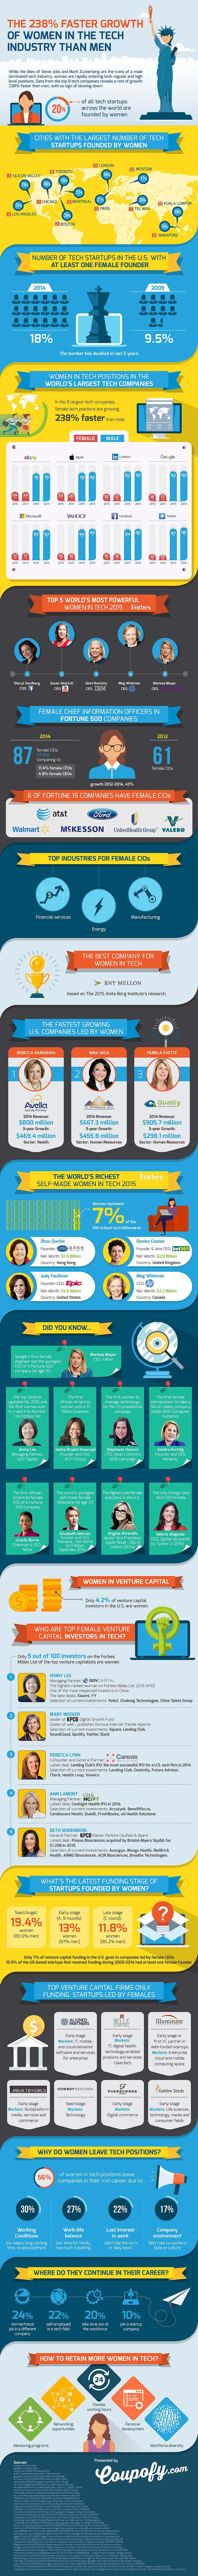 Women in Tech Infographic